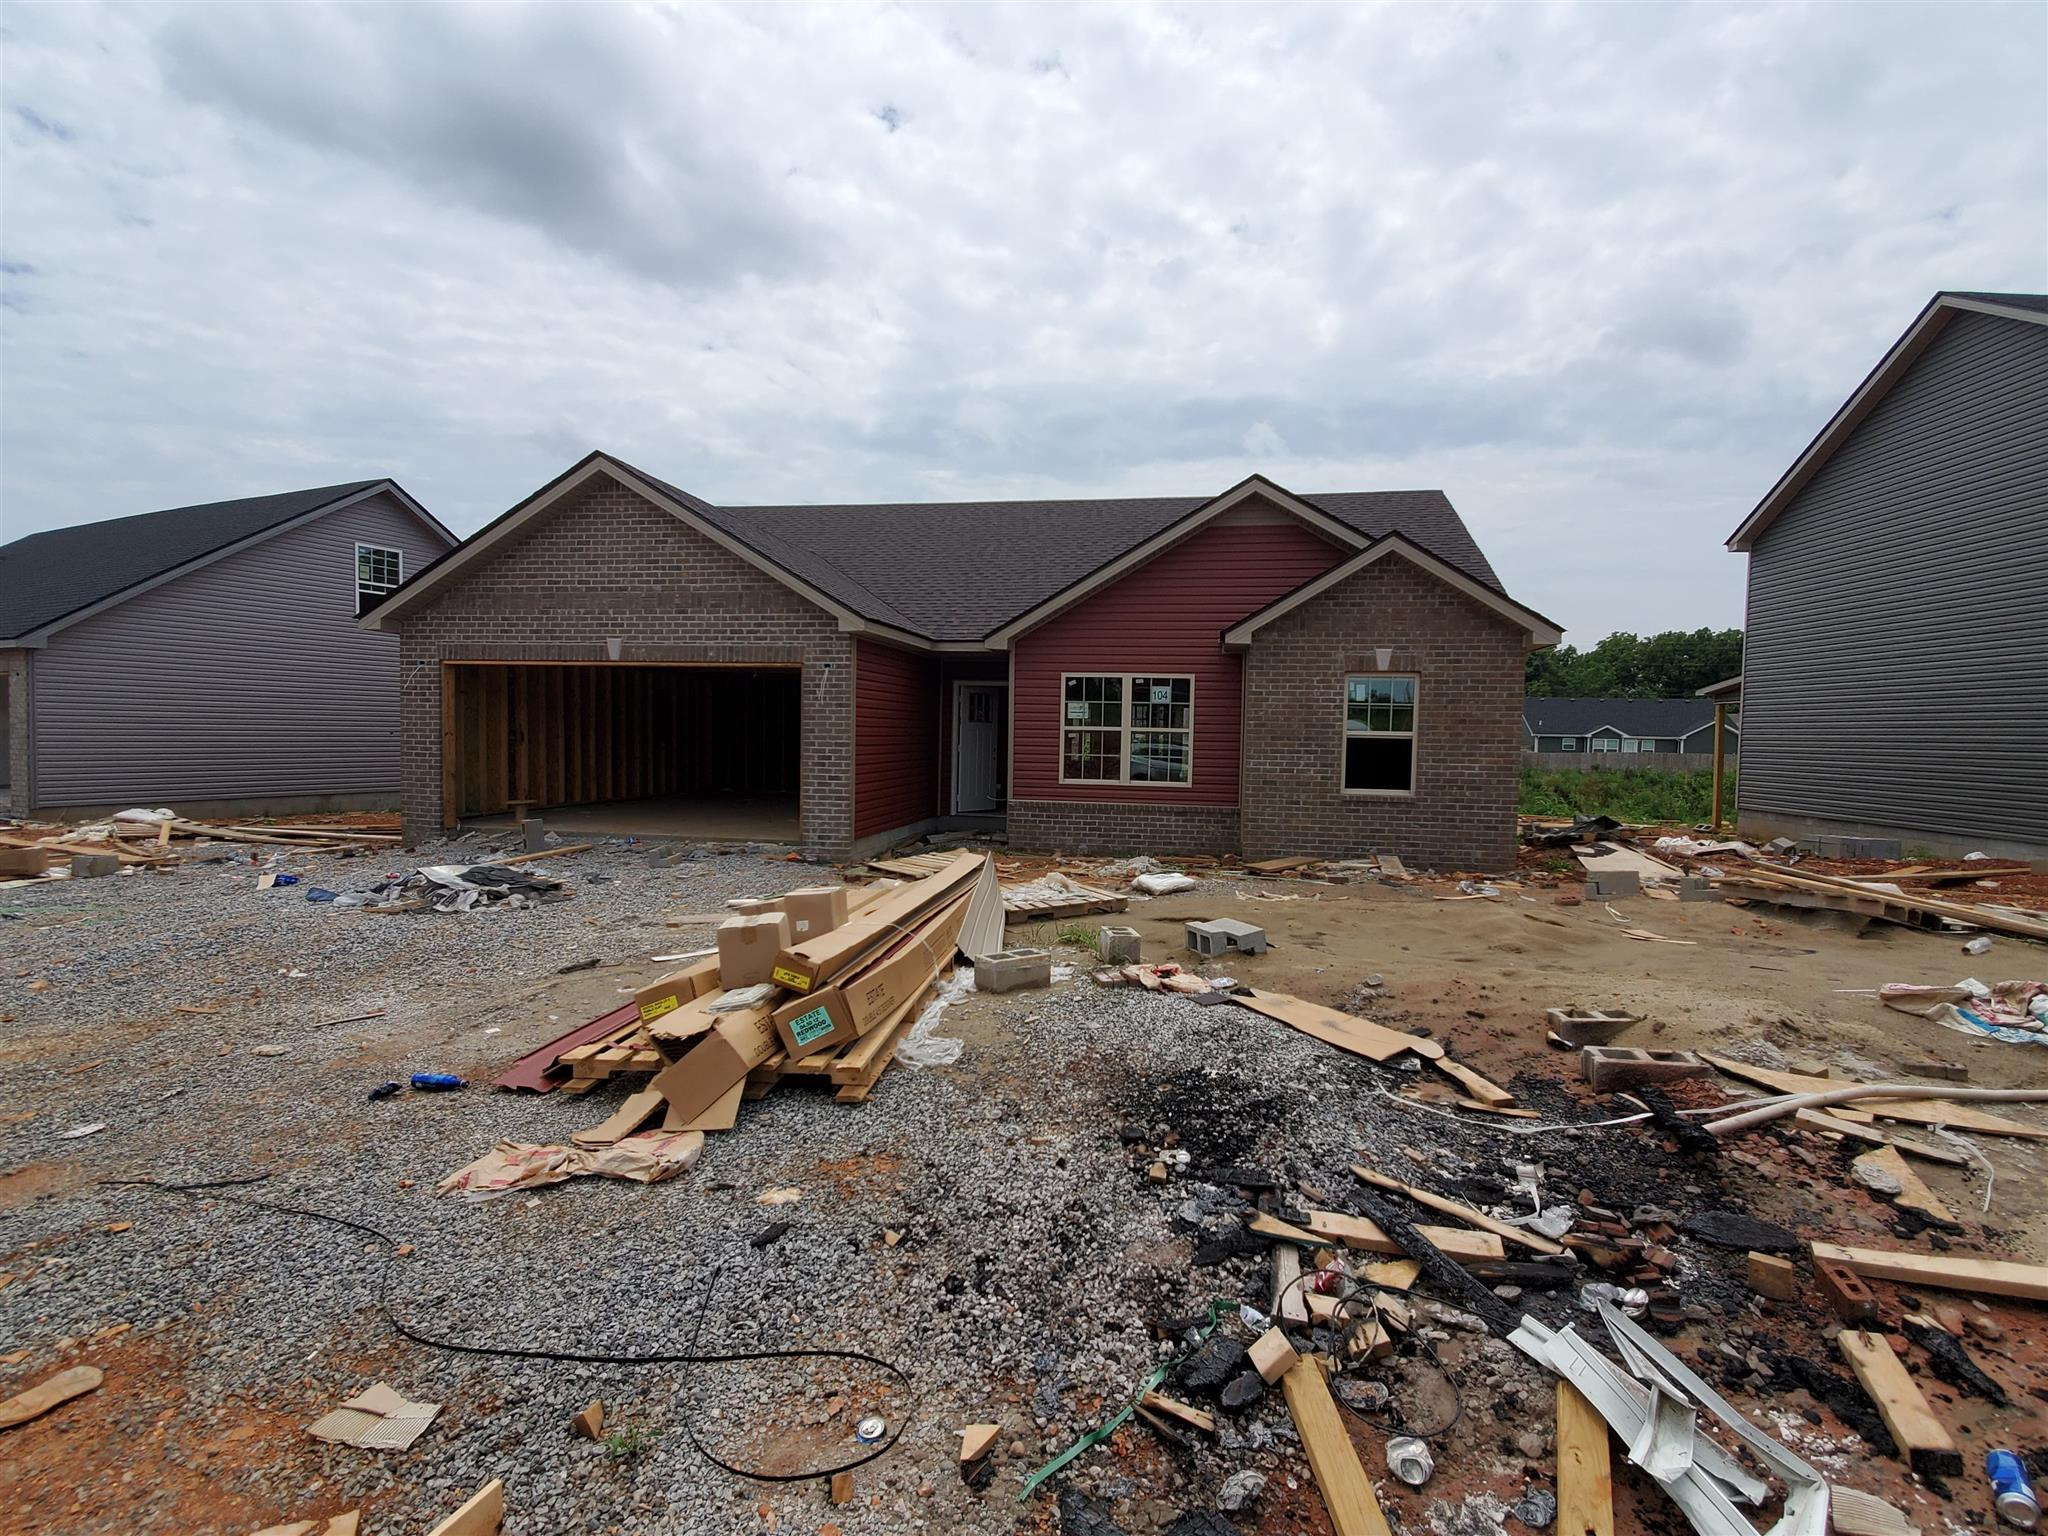 104 Rose Edd Estates, Oak Grove, KY 42262 - Oak Grove, KY real estate listing